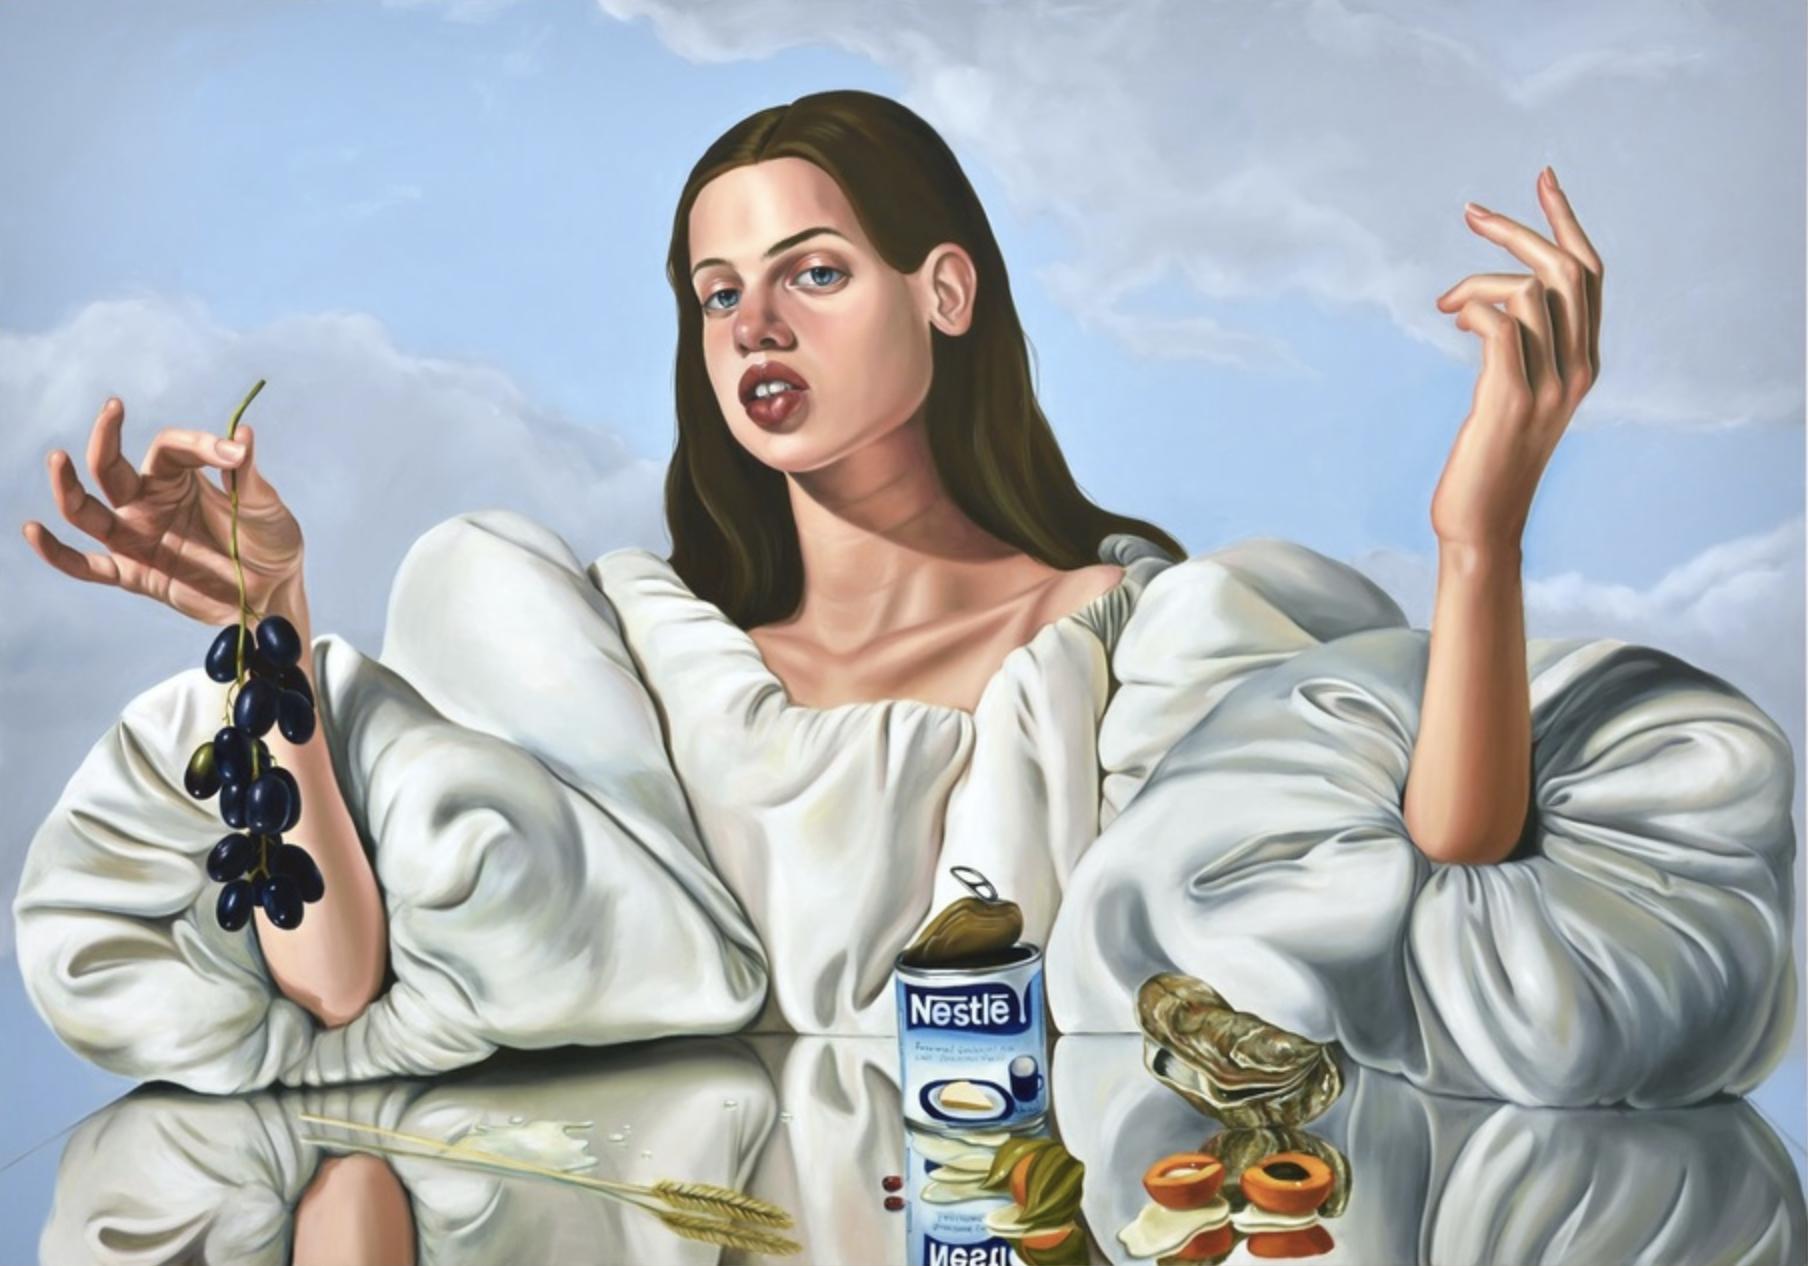 Chloe Wise — Artist